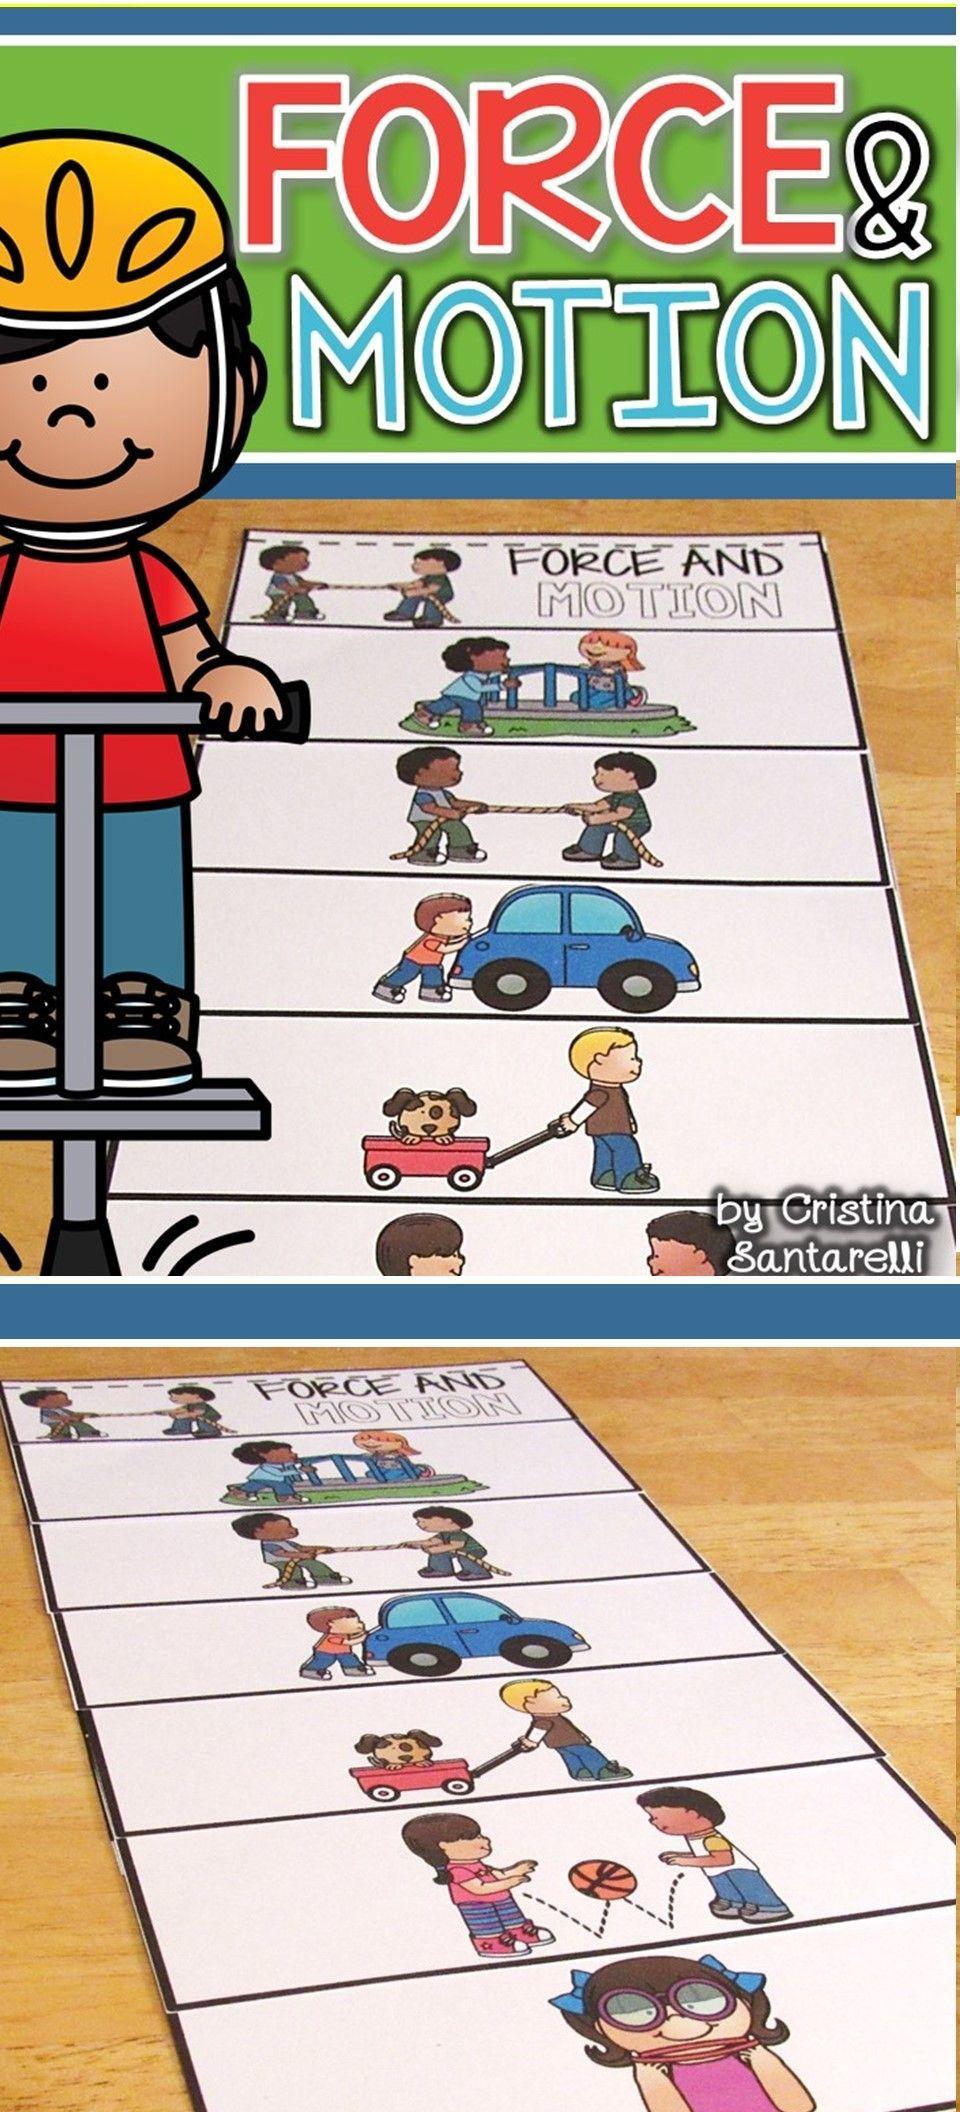 Force And Motion Kindergarten Worksheets In 2020 Force And Motion Motion Activities Flip Book